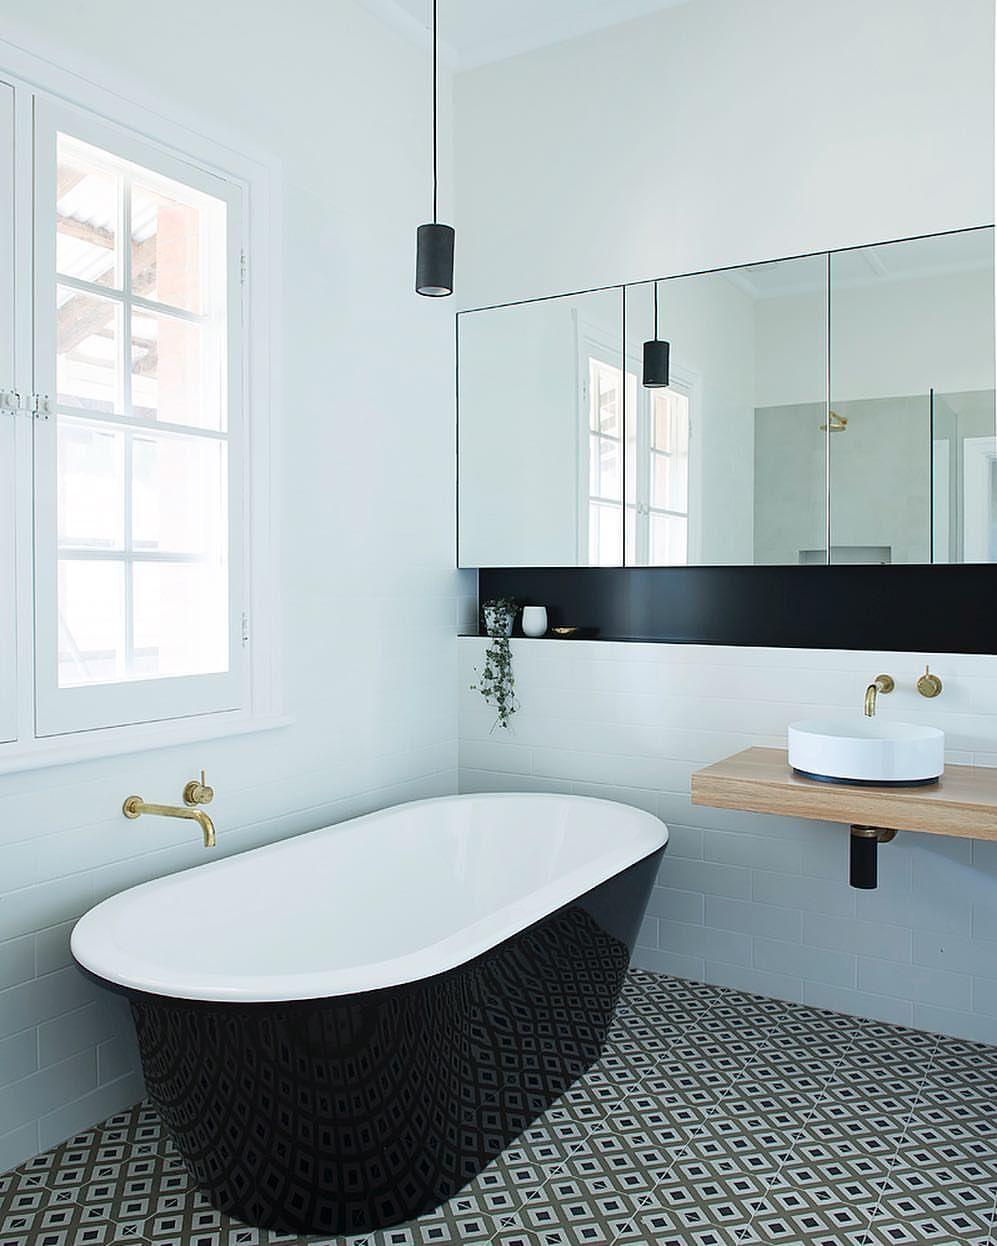 Best Kitchen Gallery: 327 Likes 45 Ments Jane Ledger Janeledgerinteriors On of Designing Bathrooms  on rachelxblog.com